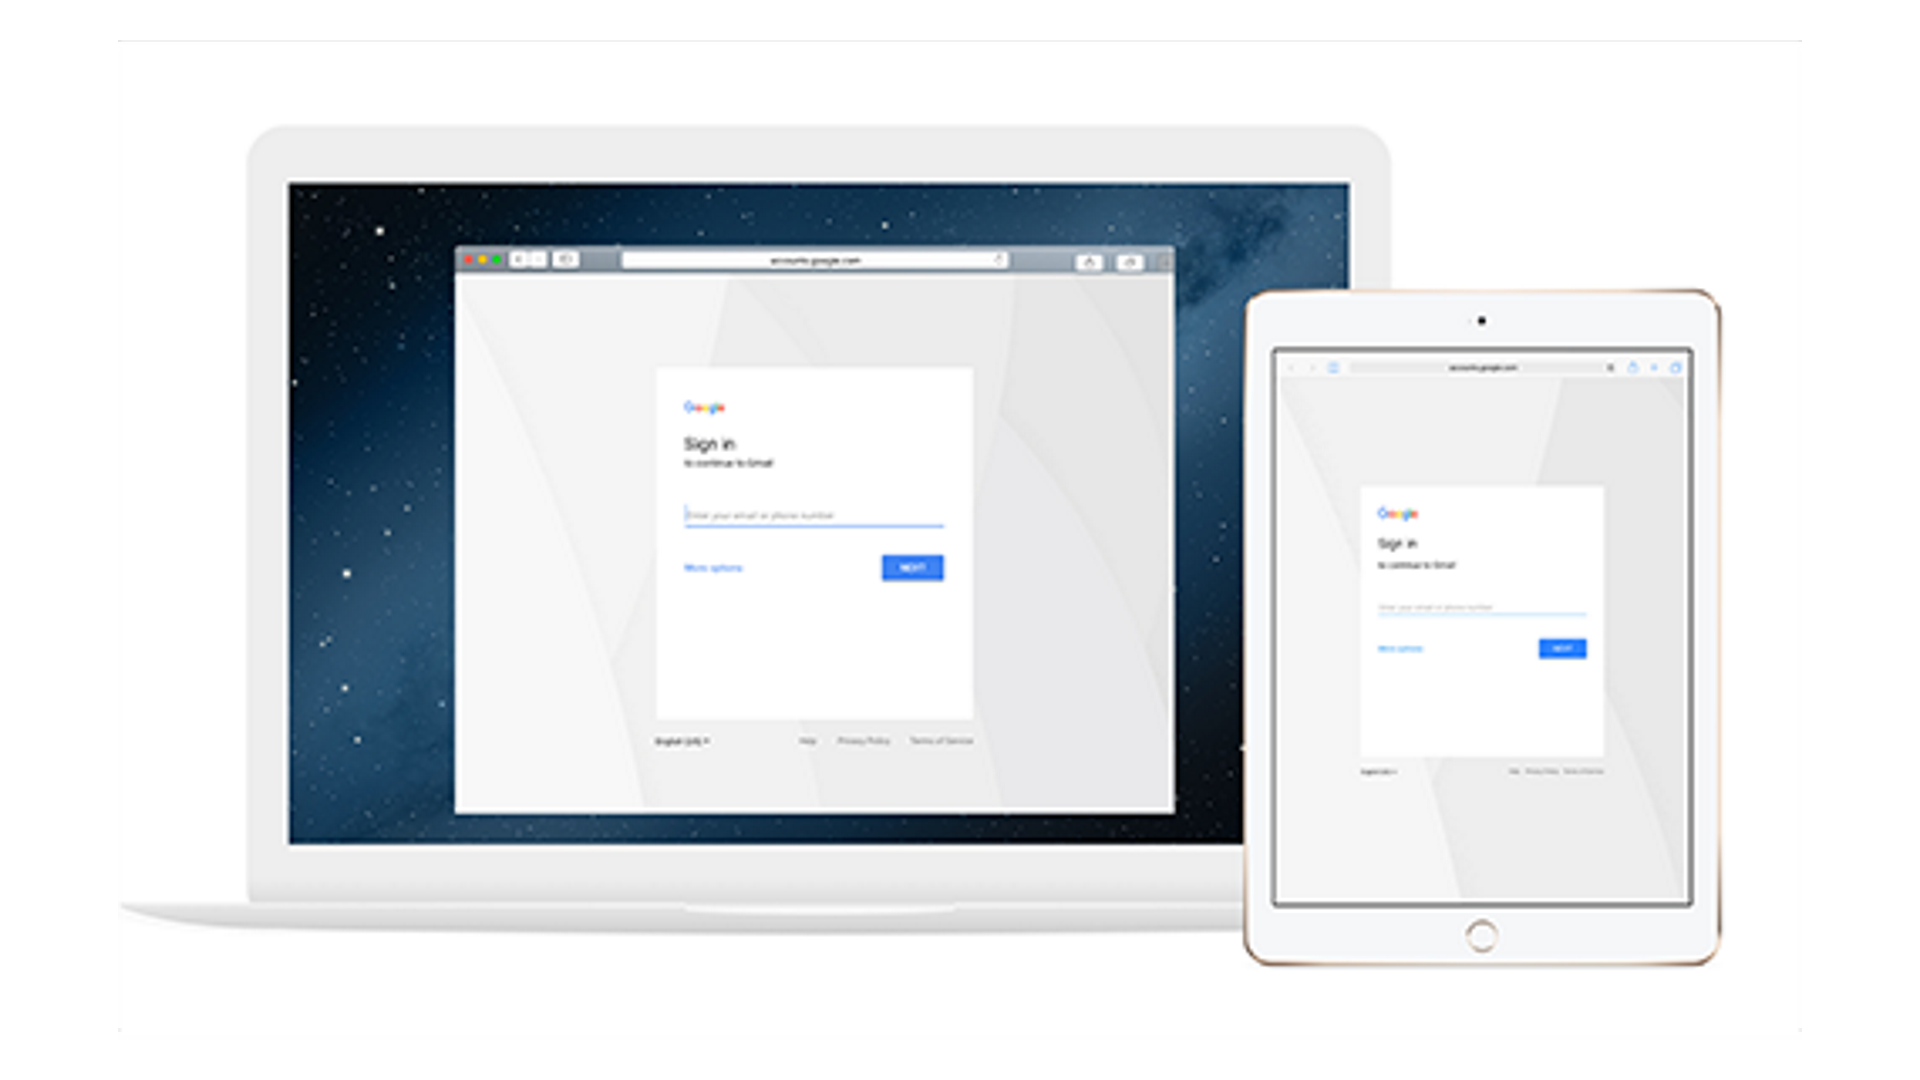 Googleが新しいログインページ導入を発表、4月10日からデスクトップとモバイルで統一へ